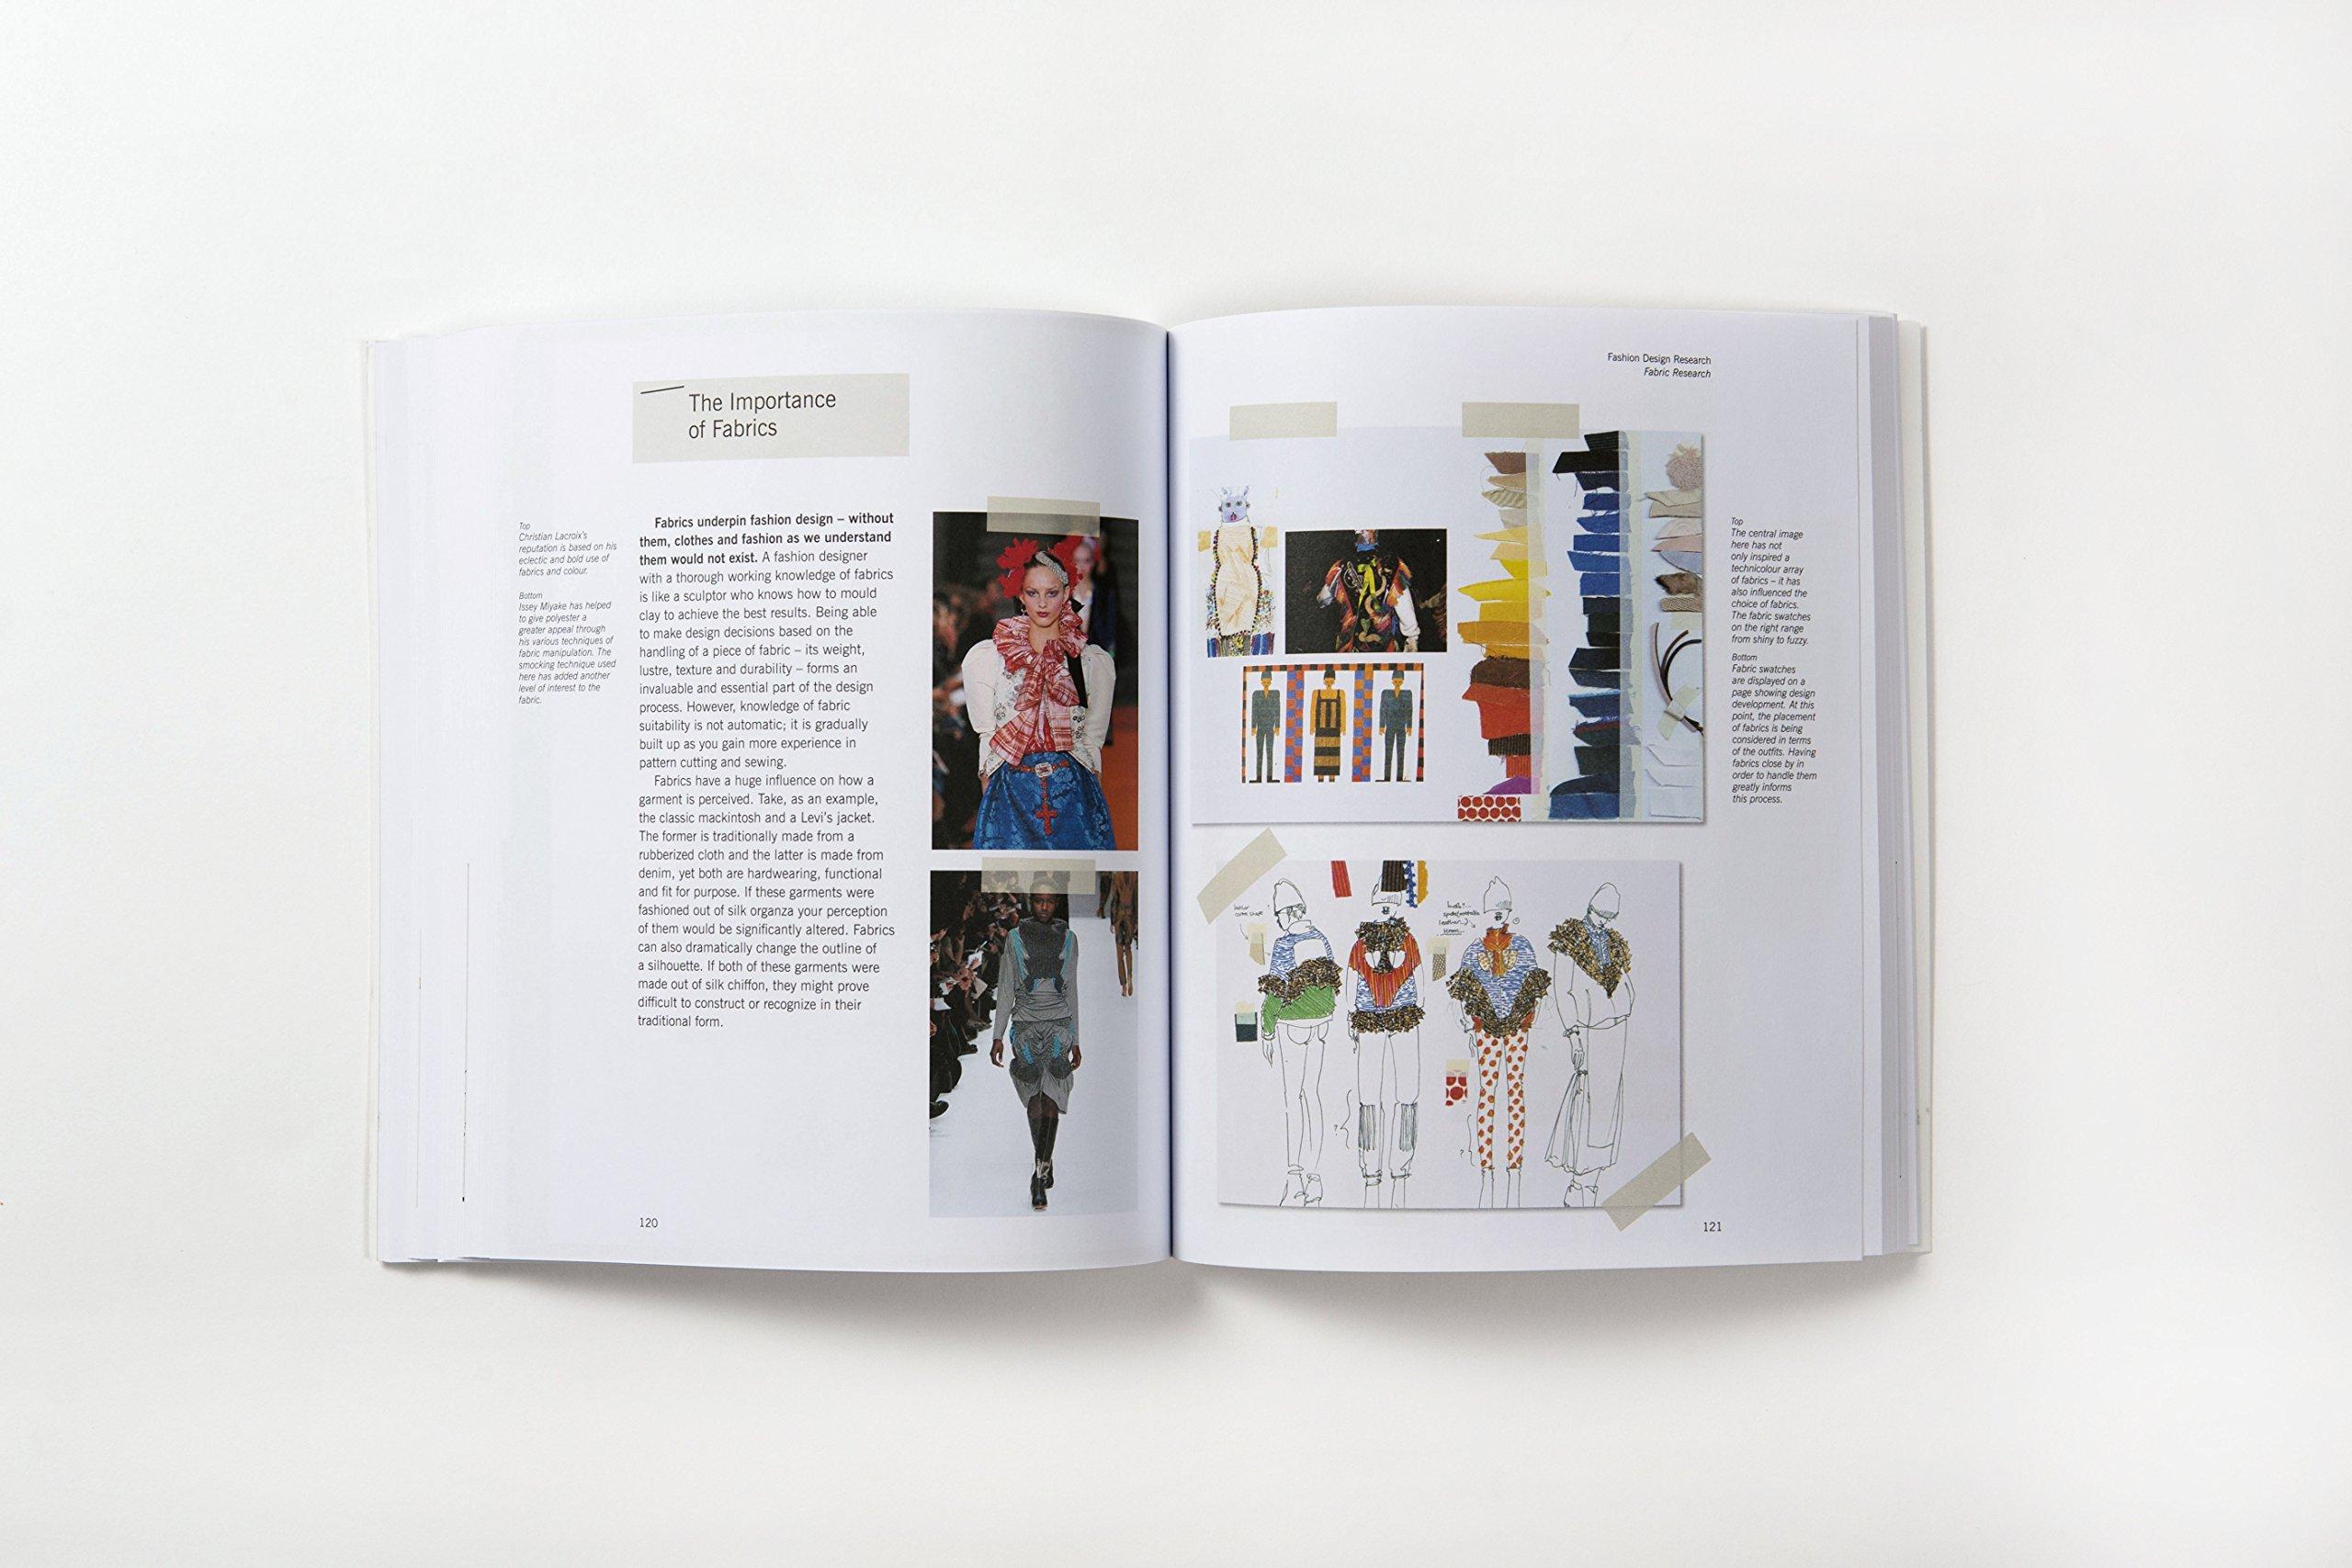 Fashion Design Research Mbonu Ezinma 9781780671796 Amazon Com Books